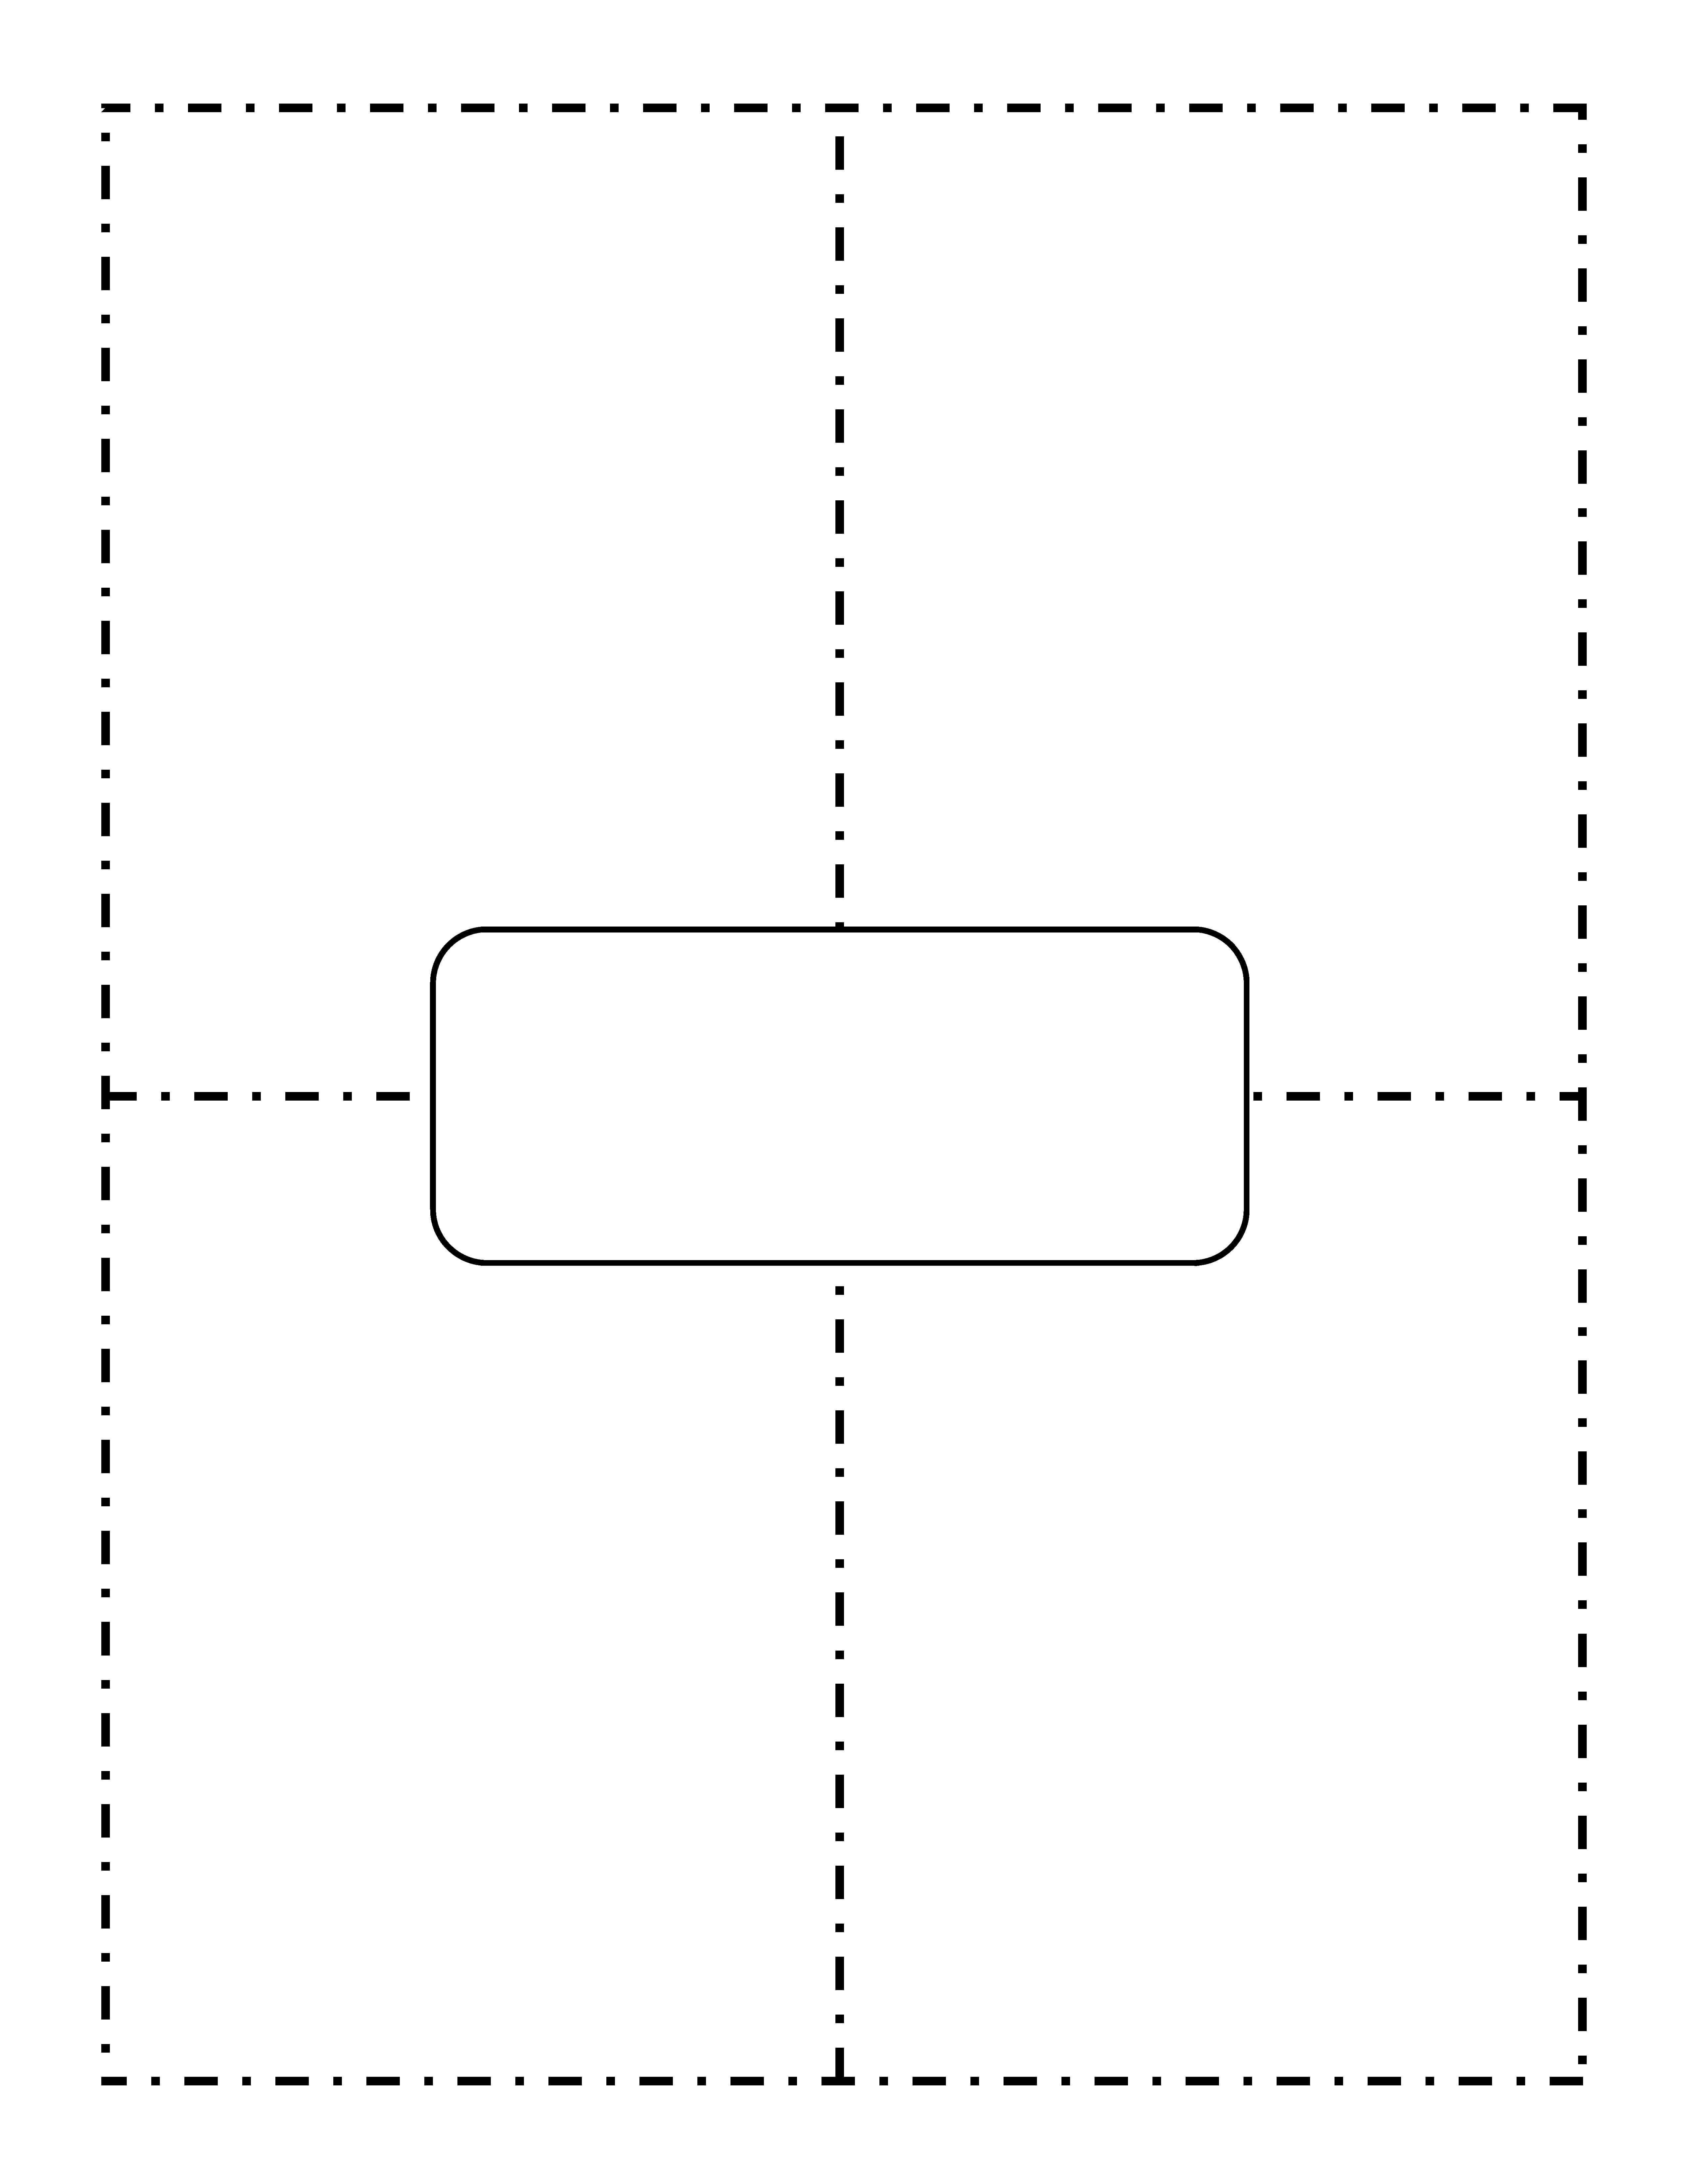 Frayer Diagram Pdf - Major.magdalene-Project regarding Blank Frayer Model Template